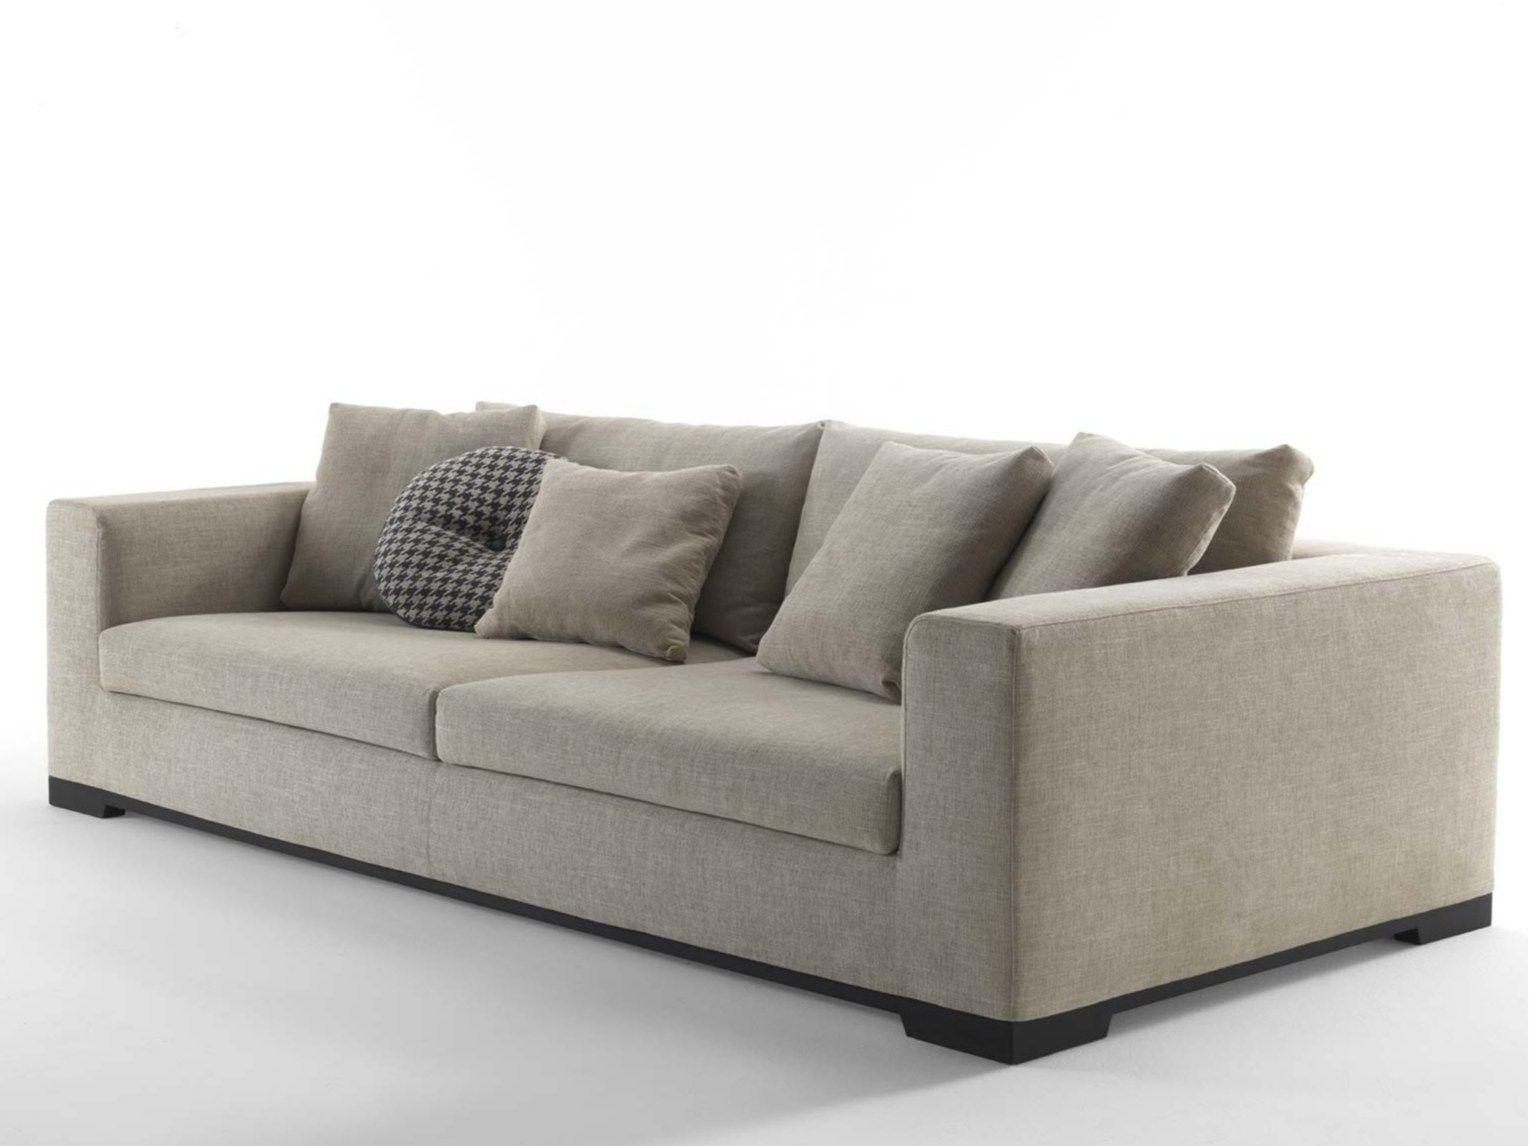 Sofa Stil sofa stil medium size of exklusiv sofa die exklusive